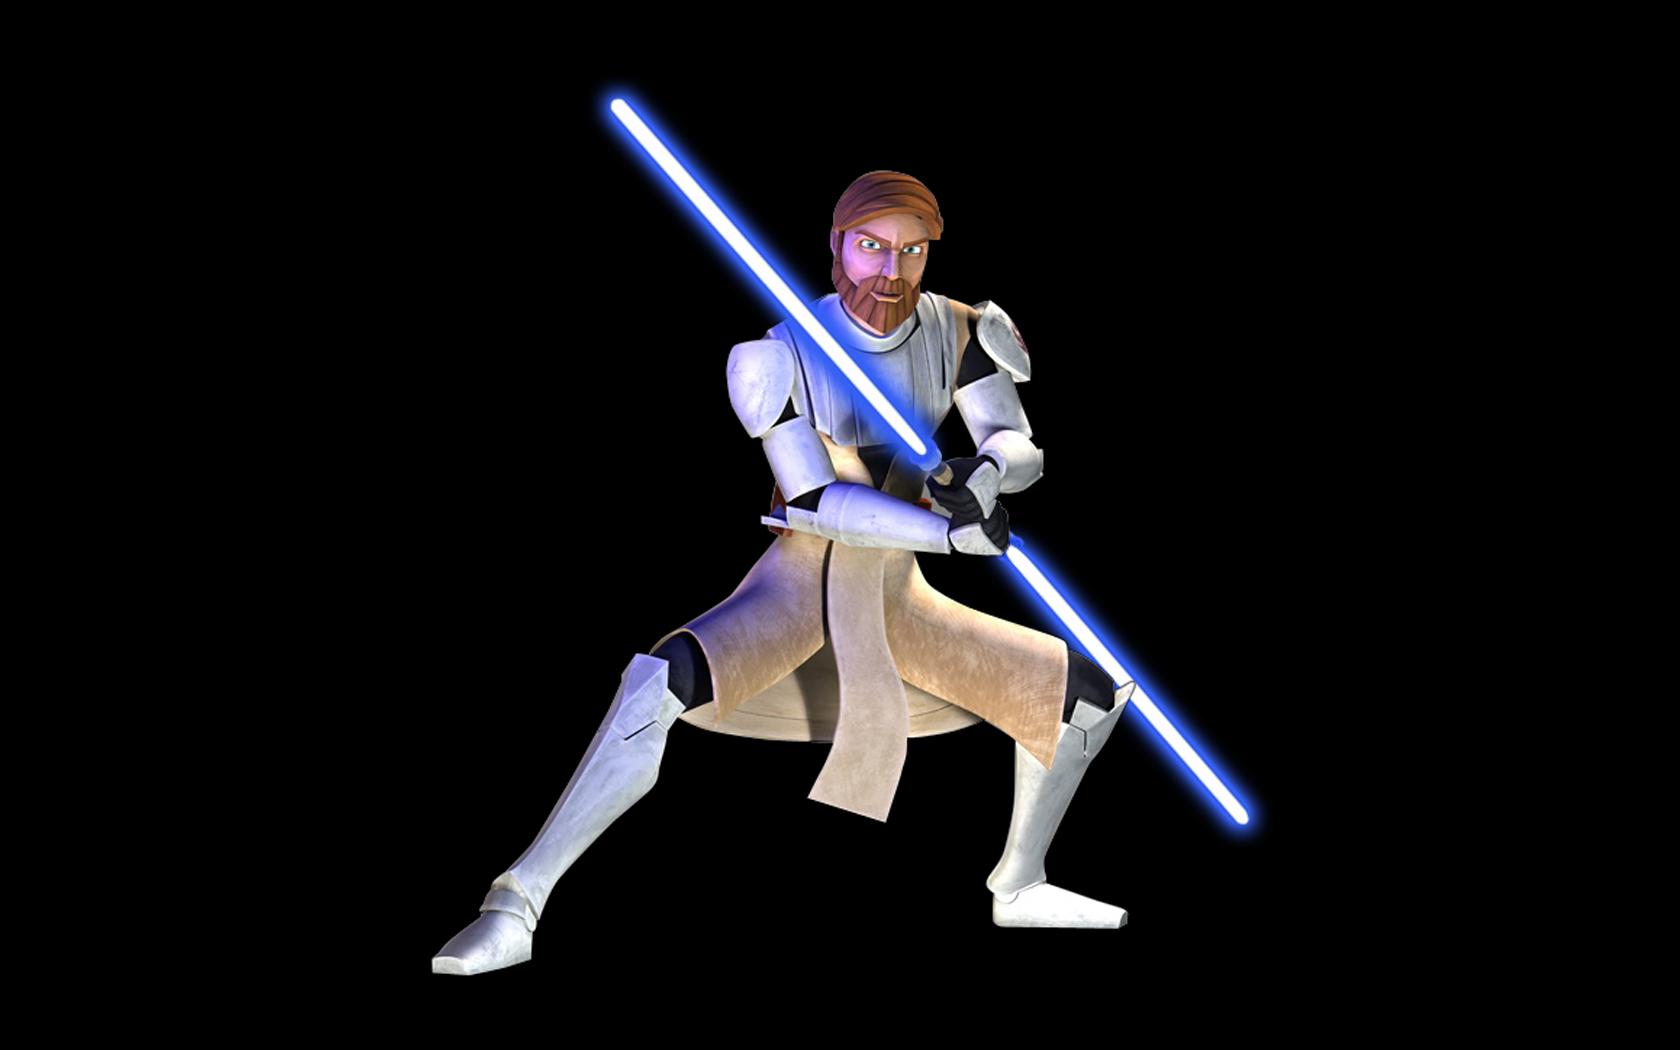 Obi Wan Kenobi Wallpaper Wallpaper   ForWallpapercom 1680x1050